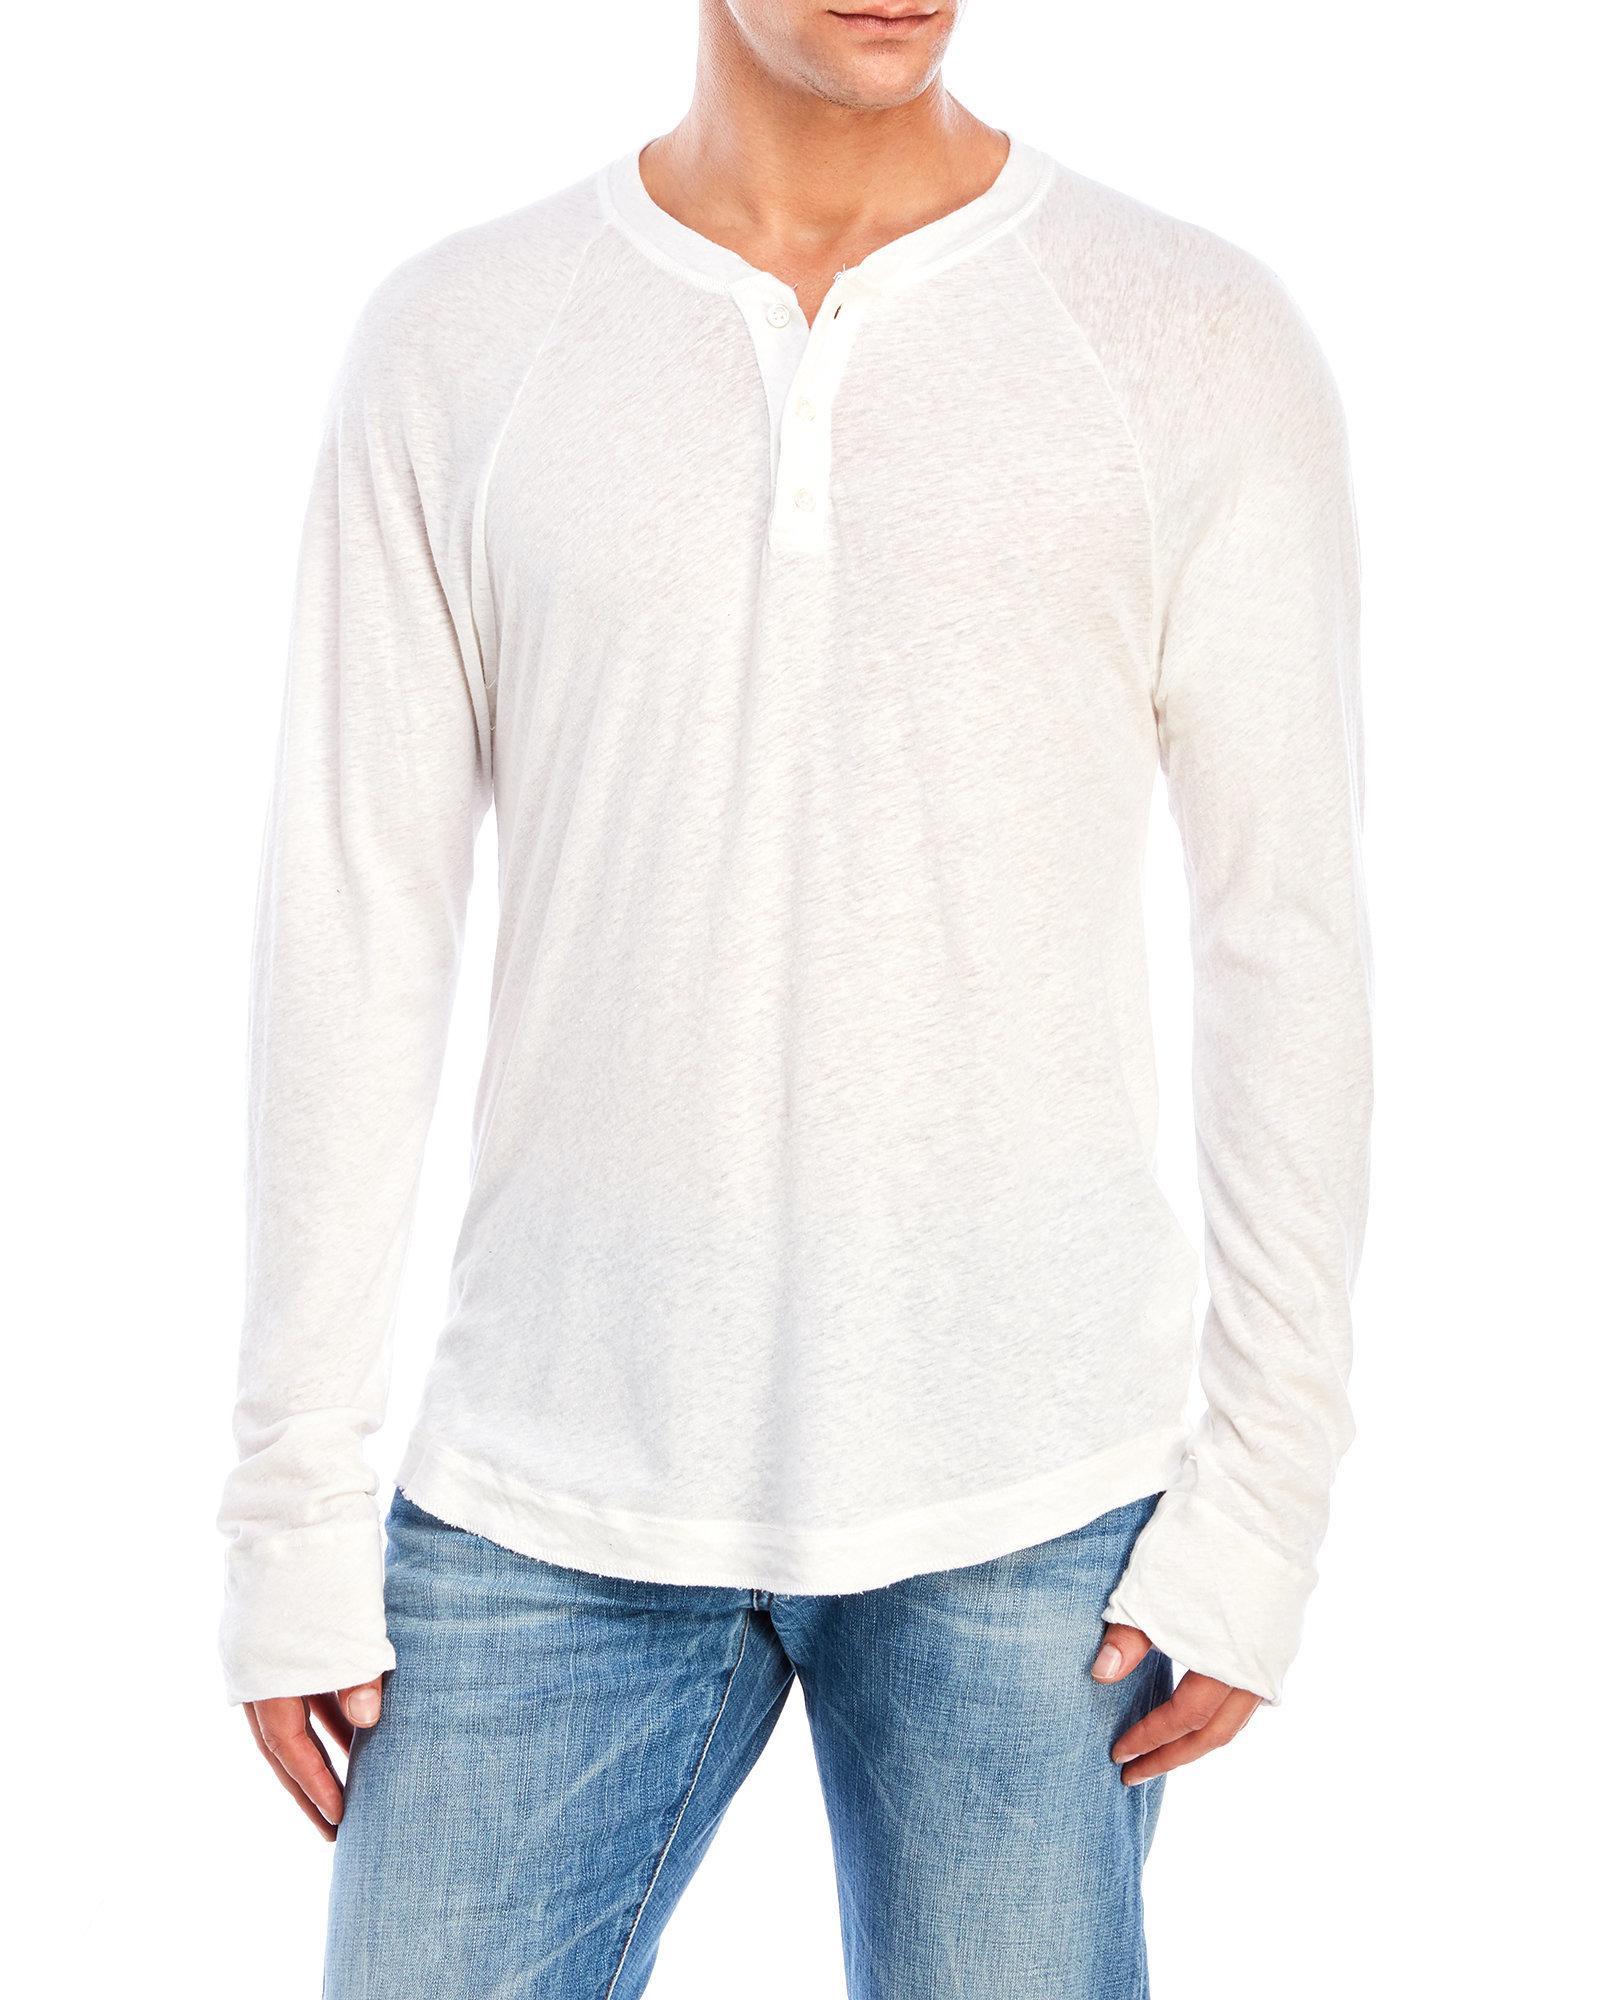 James Perse Linen Blend Raglan Henley In White For Men Lyst